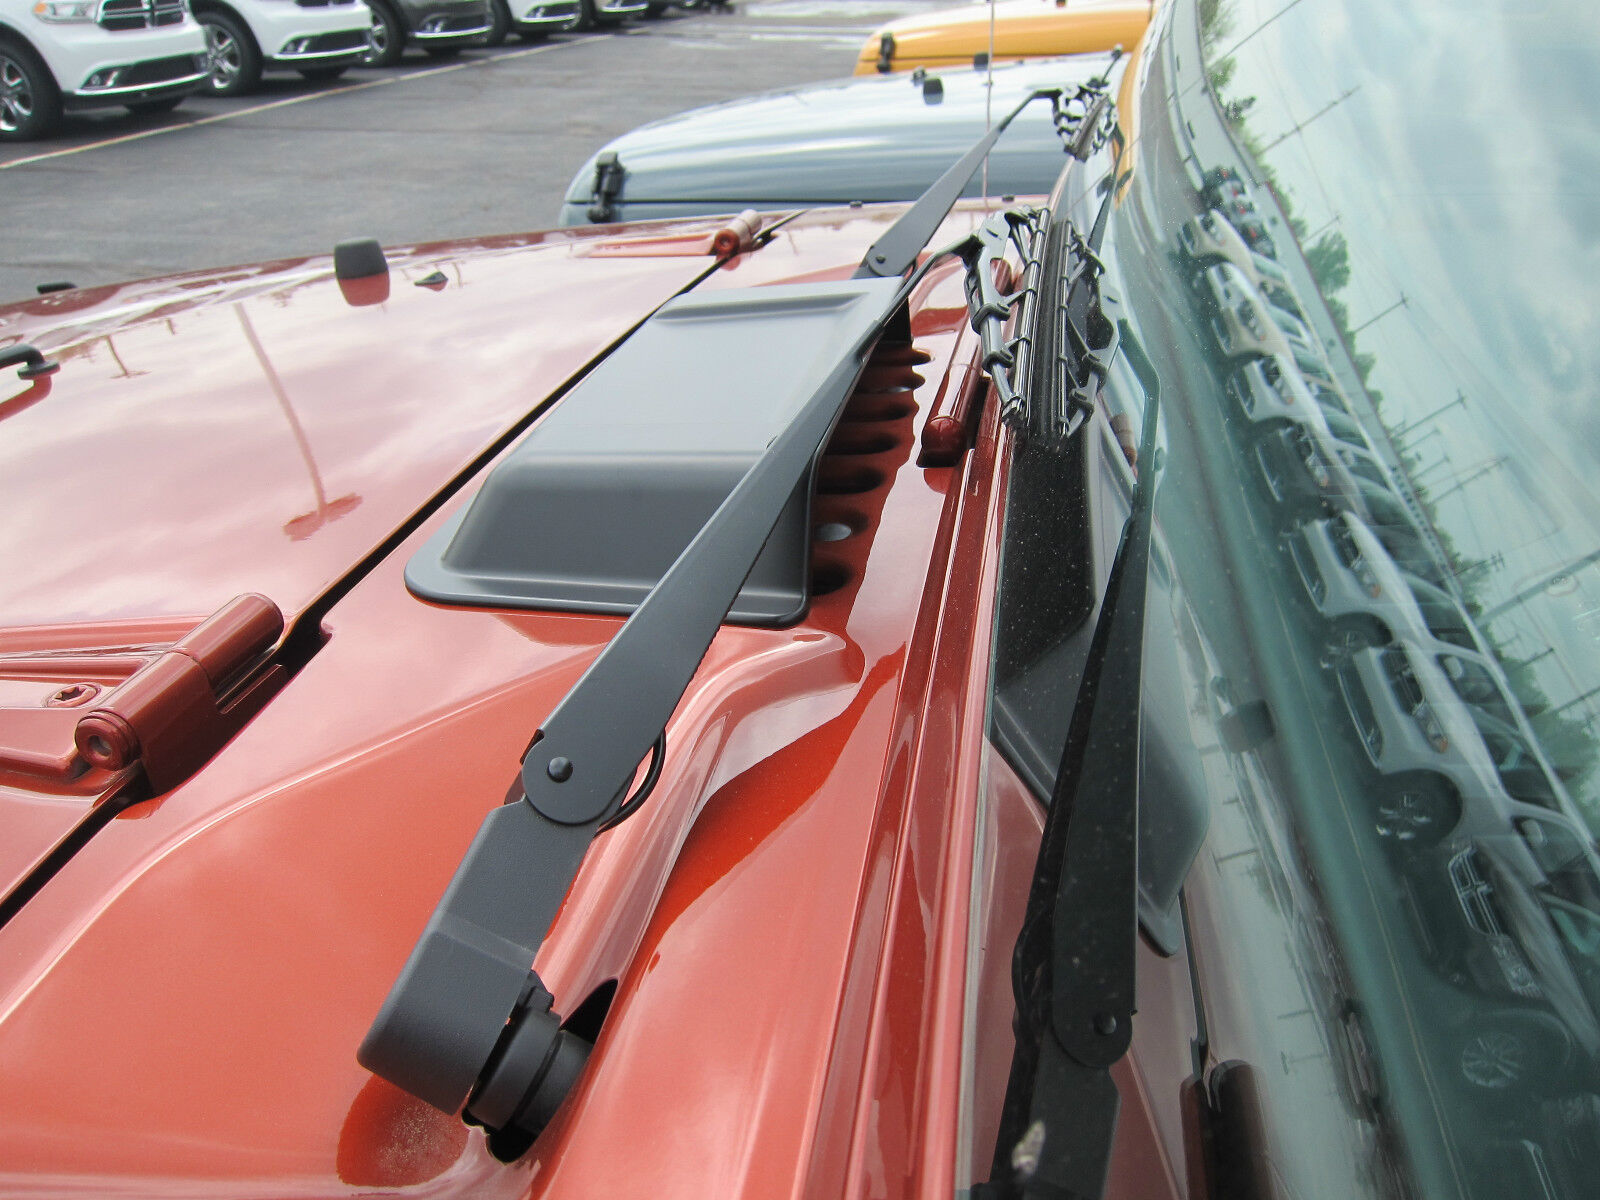 Jeep Renegade Aspen >> 1998-2018 Jeep Wrangler TJ JK Hood Cowl Vent Scoop Mopar OEM | eBay